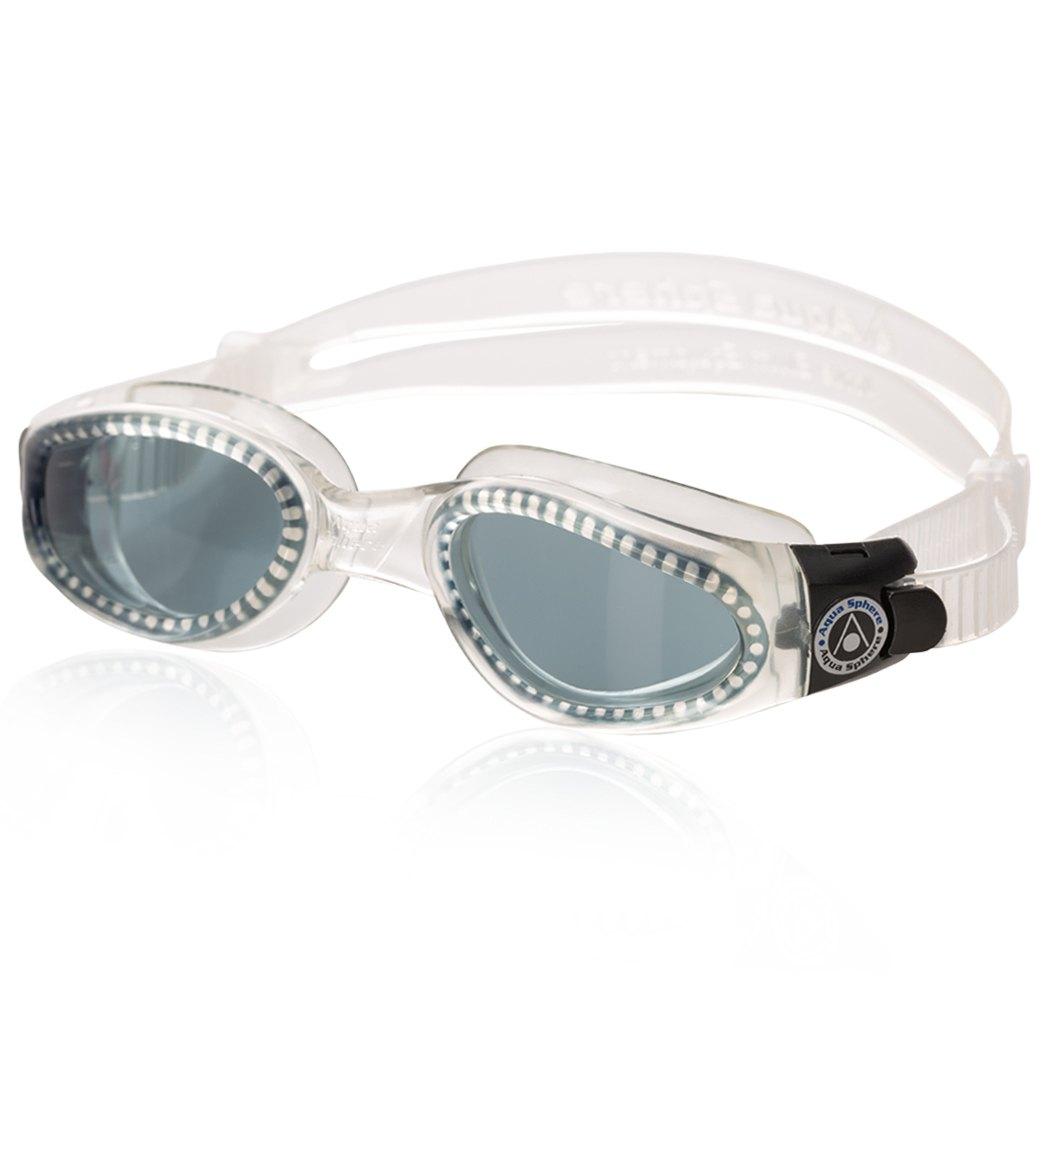 e45fb4b8806b Aqua Sphere Kaiman Goggle Smoke Lens at SwimOutlet.com